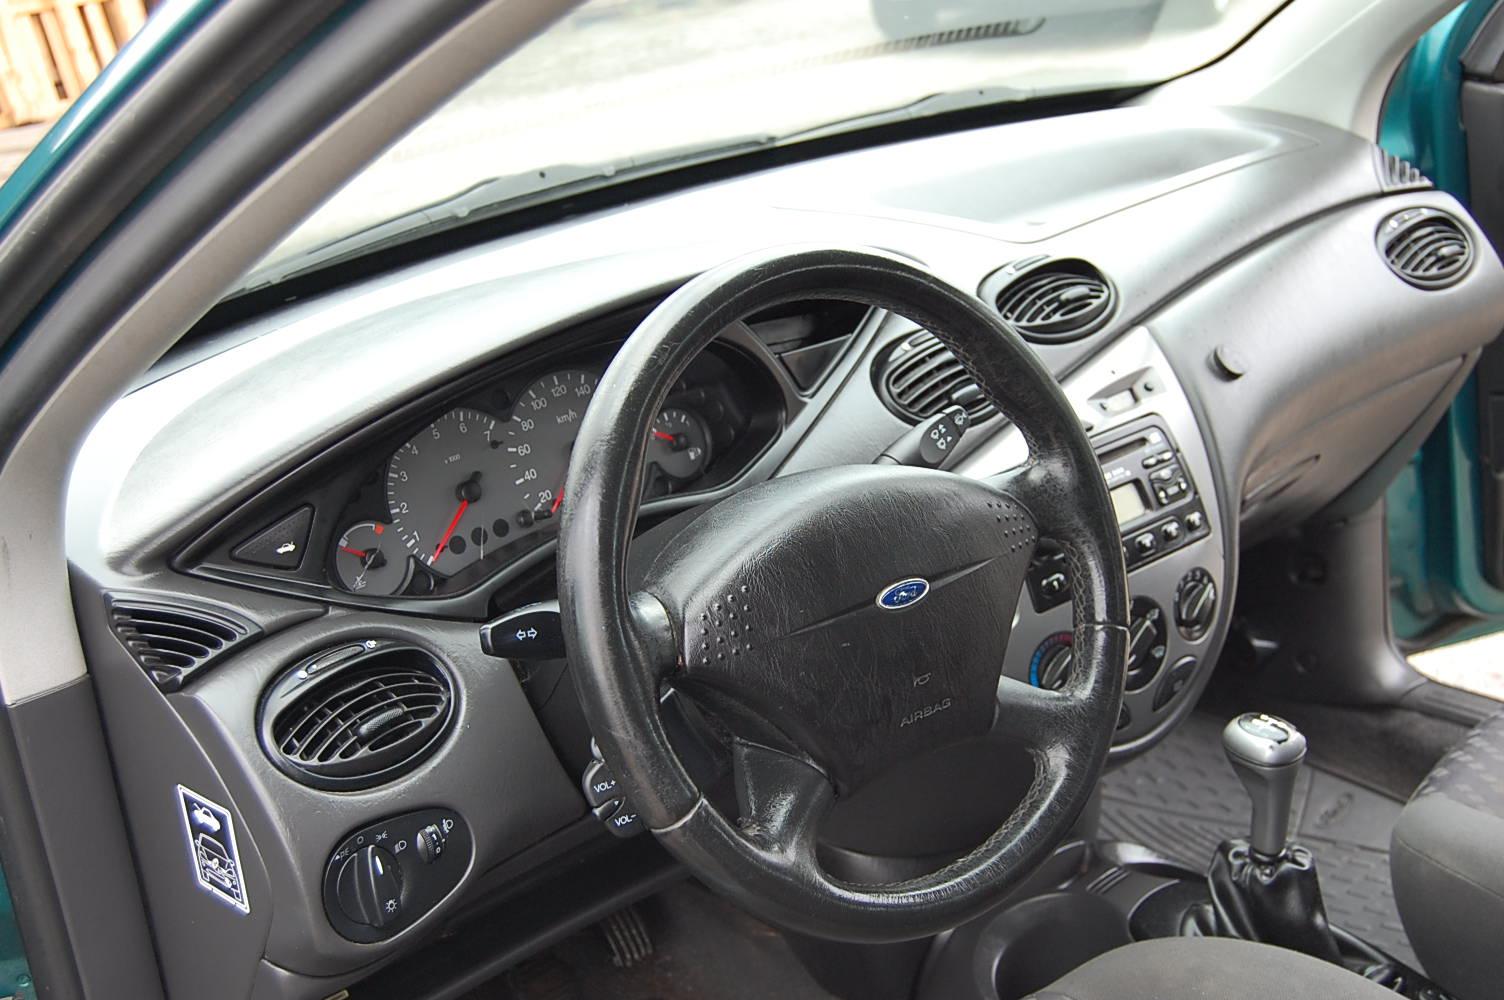 Ford Focus 1.6 -00 inredning